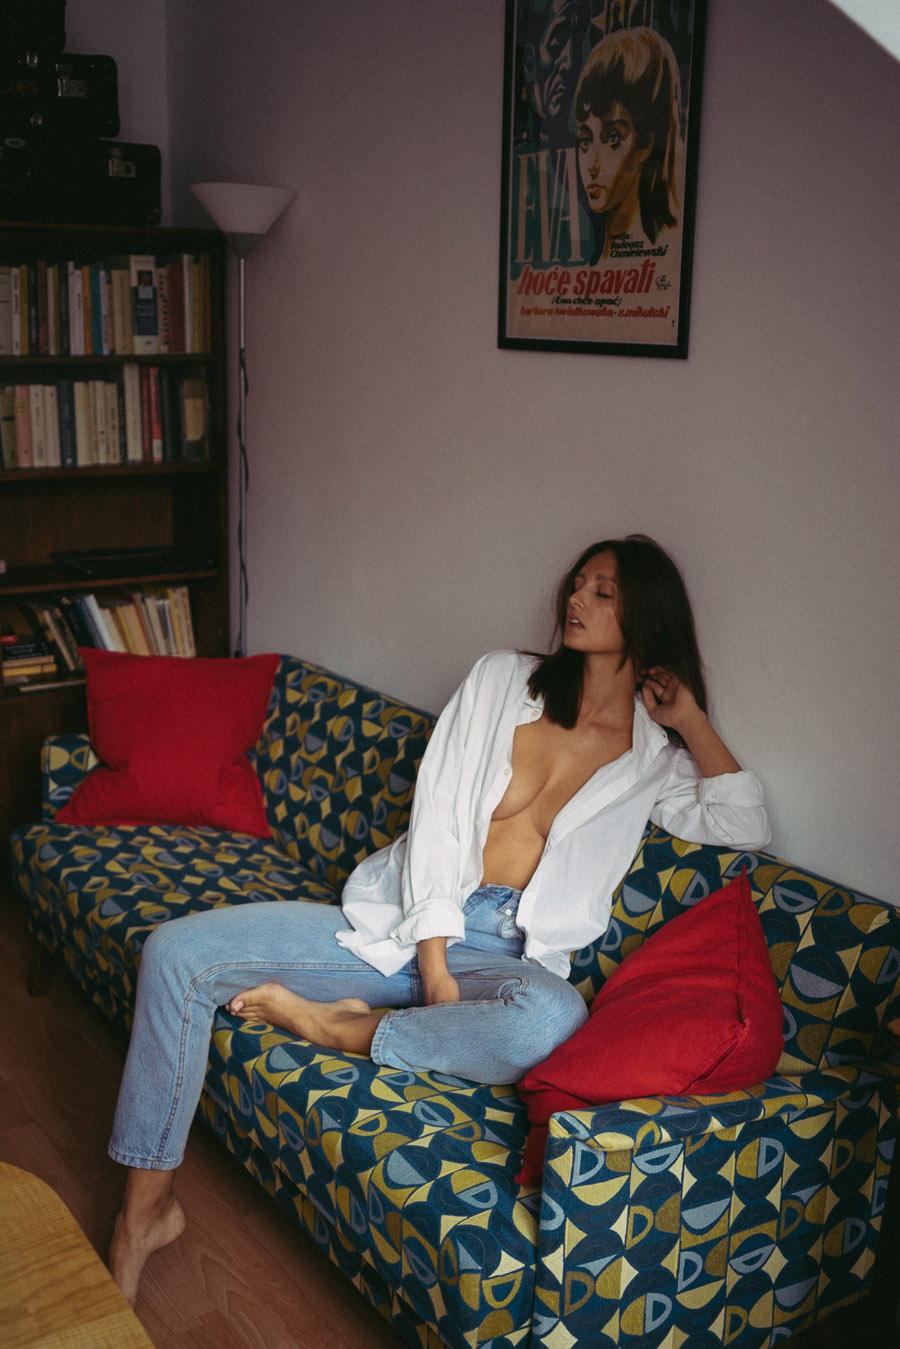 Kinga Chorostowska - Simpler Times by Marcin Krystyniak